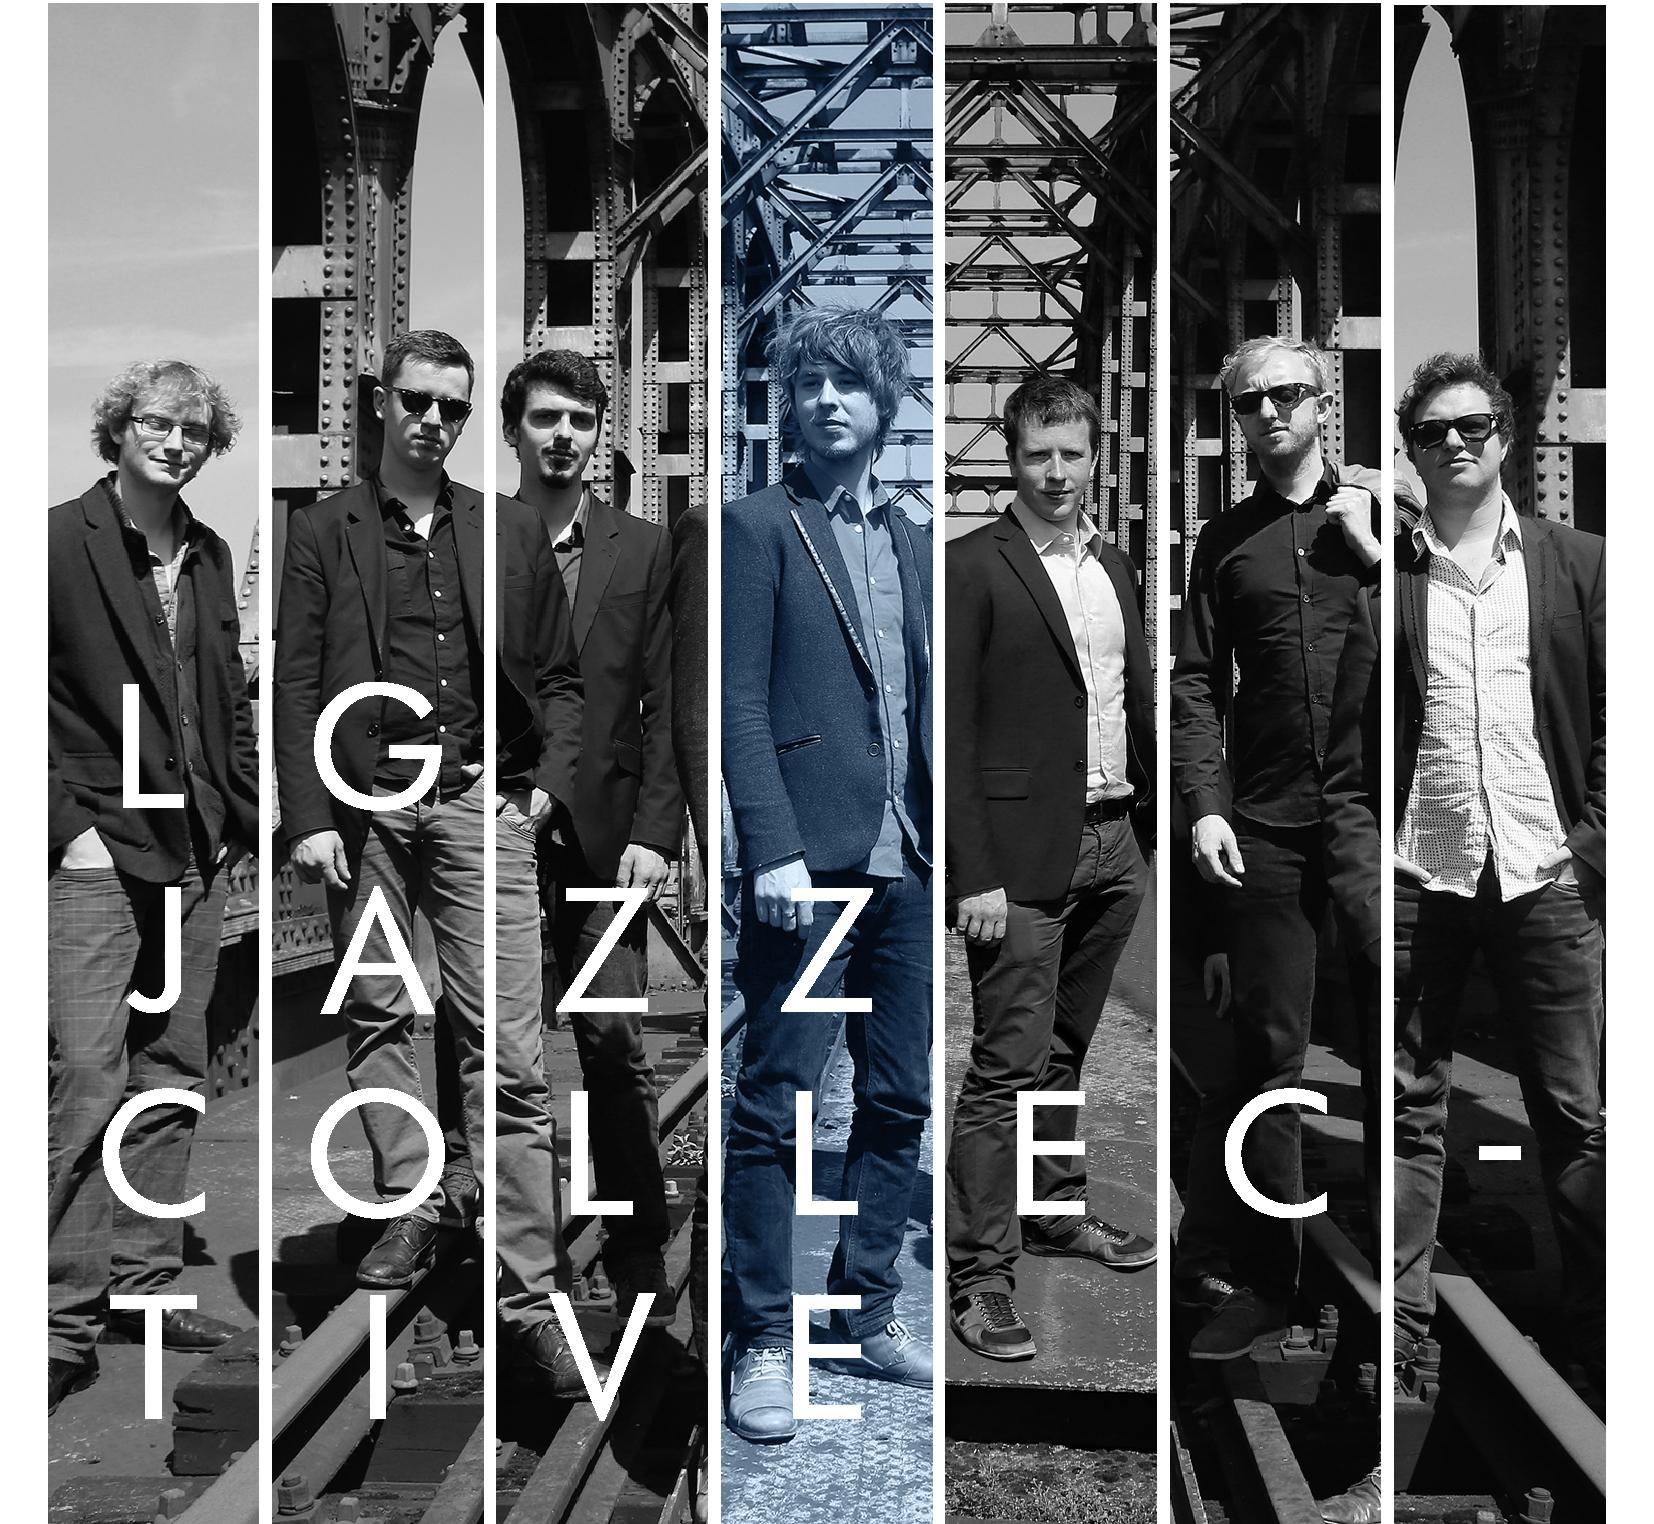 Lg Jazz Collective (feat. Igor Gehenot) : New Feel 【予約受付中】